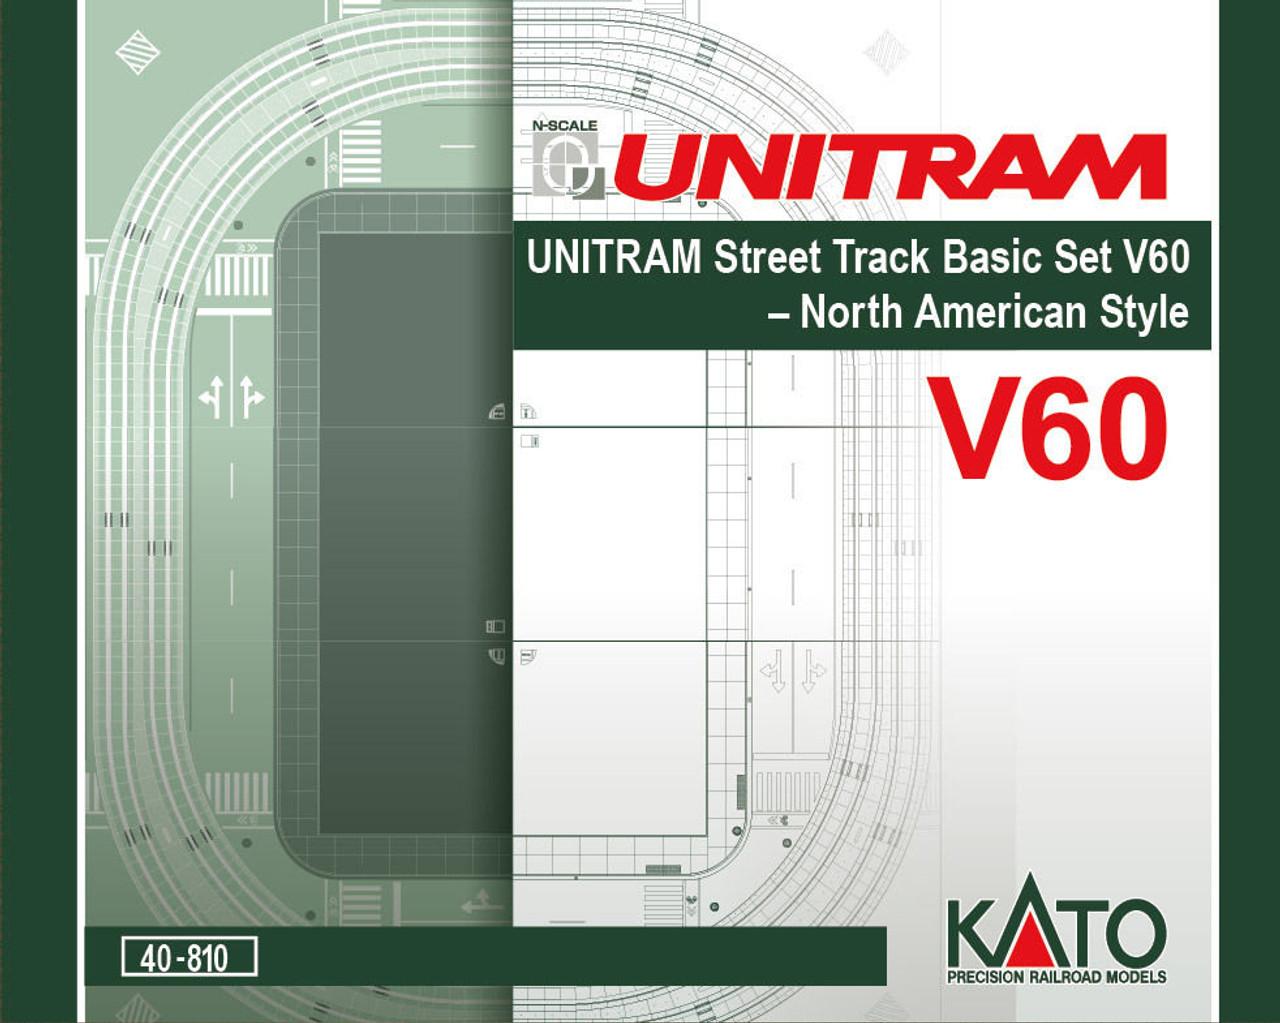 medium resolution of oval diagram models wiring diagramoval diagram models wiring diagram tutorial kato n scale v60 unitram north